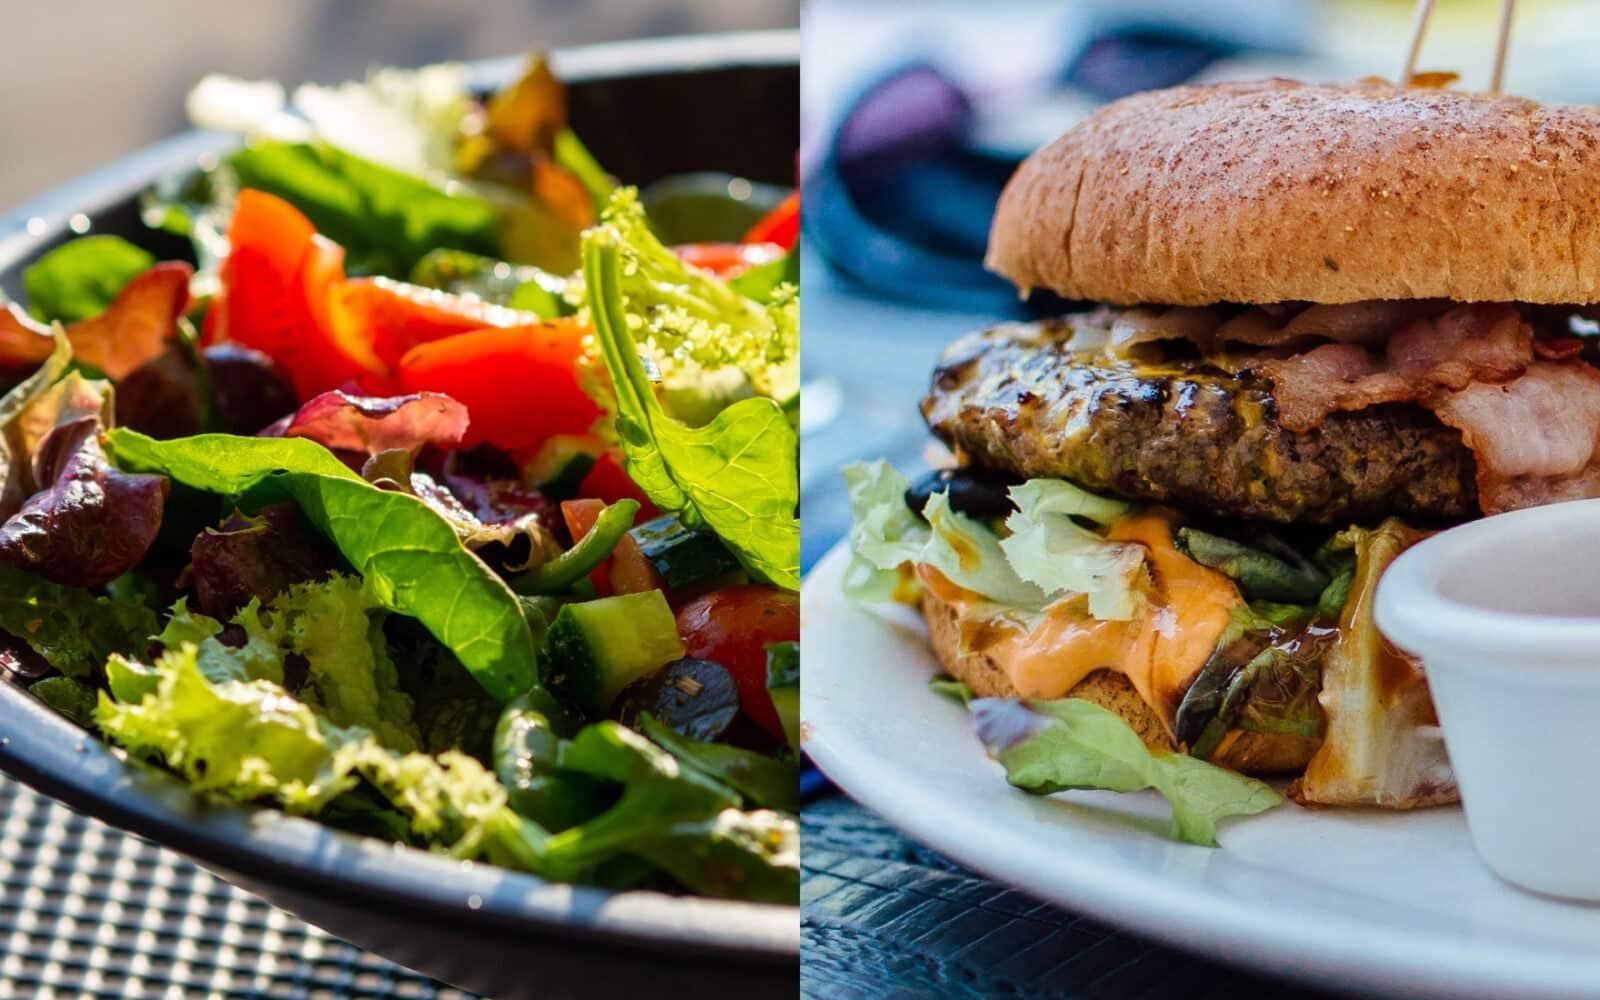 A loaded cheeseburger next to a healthy salad.